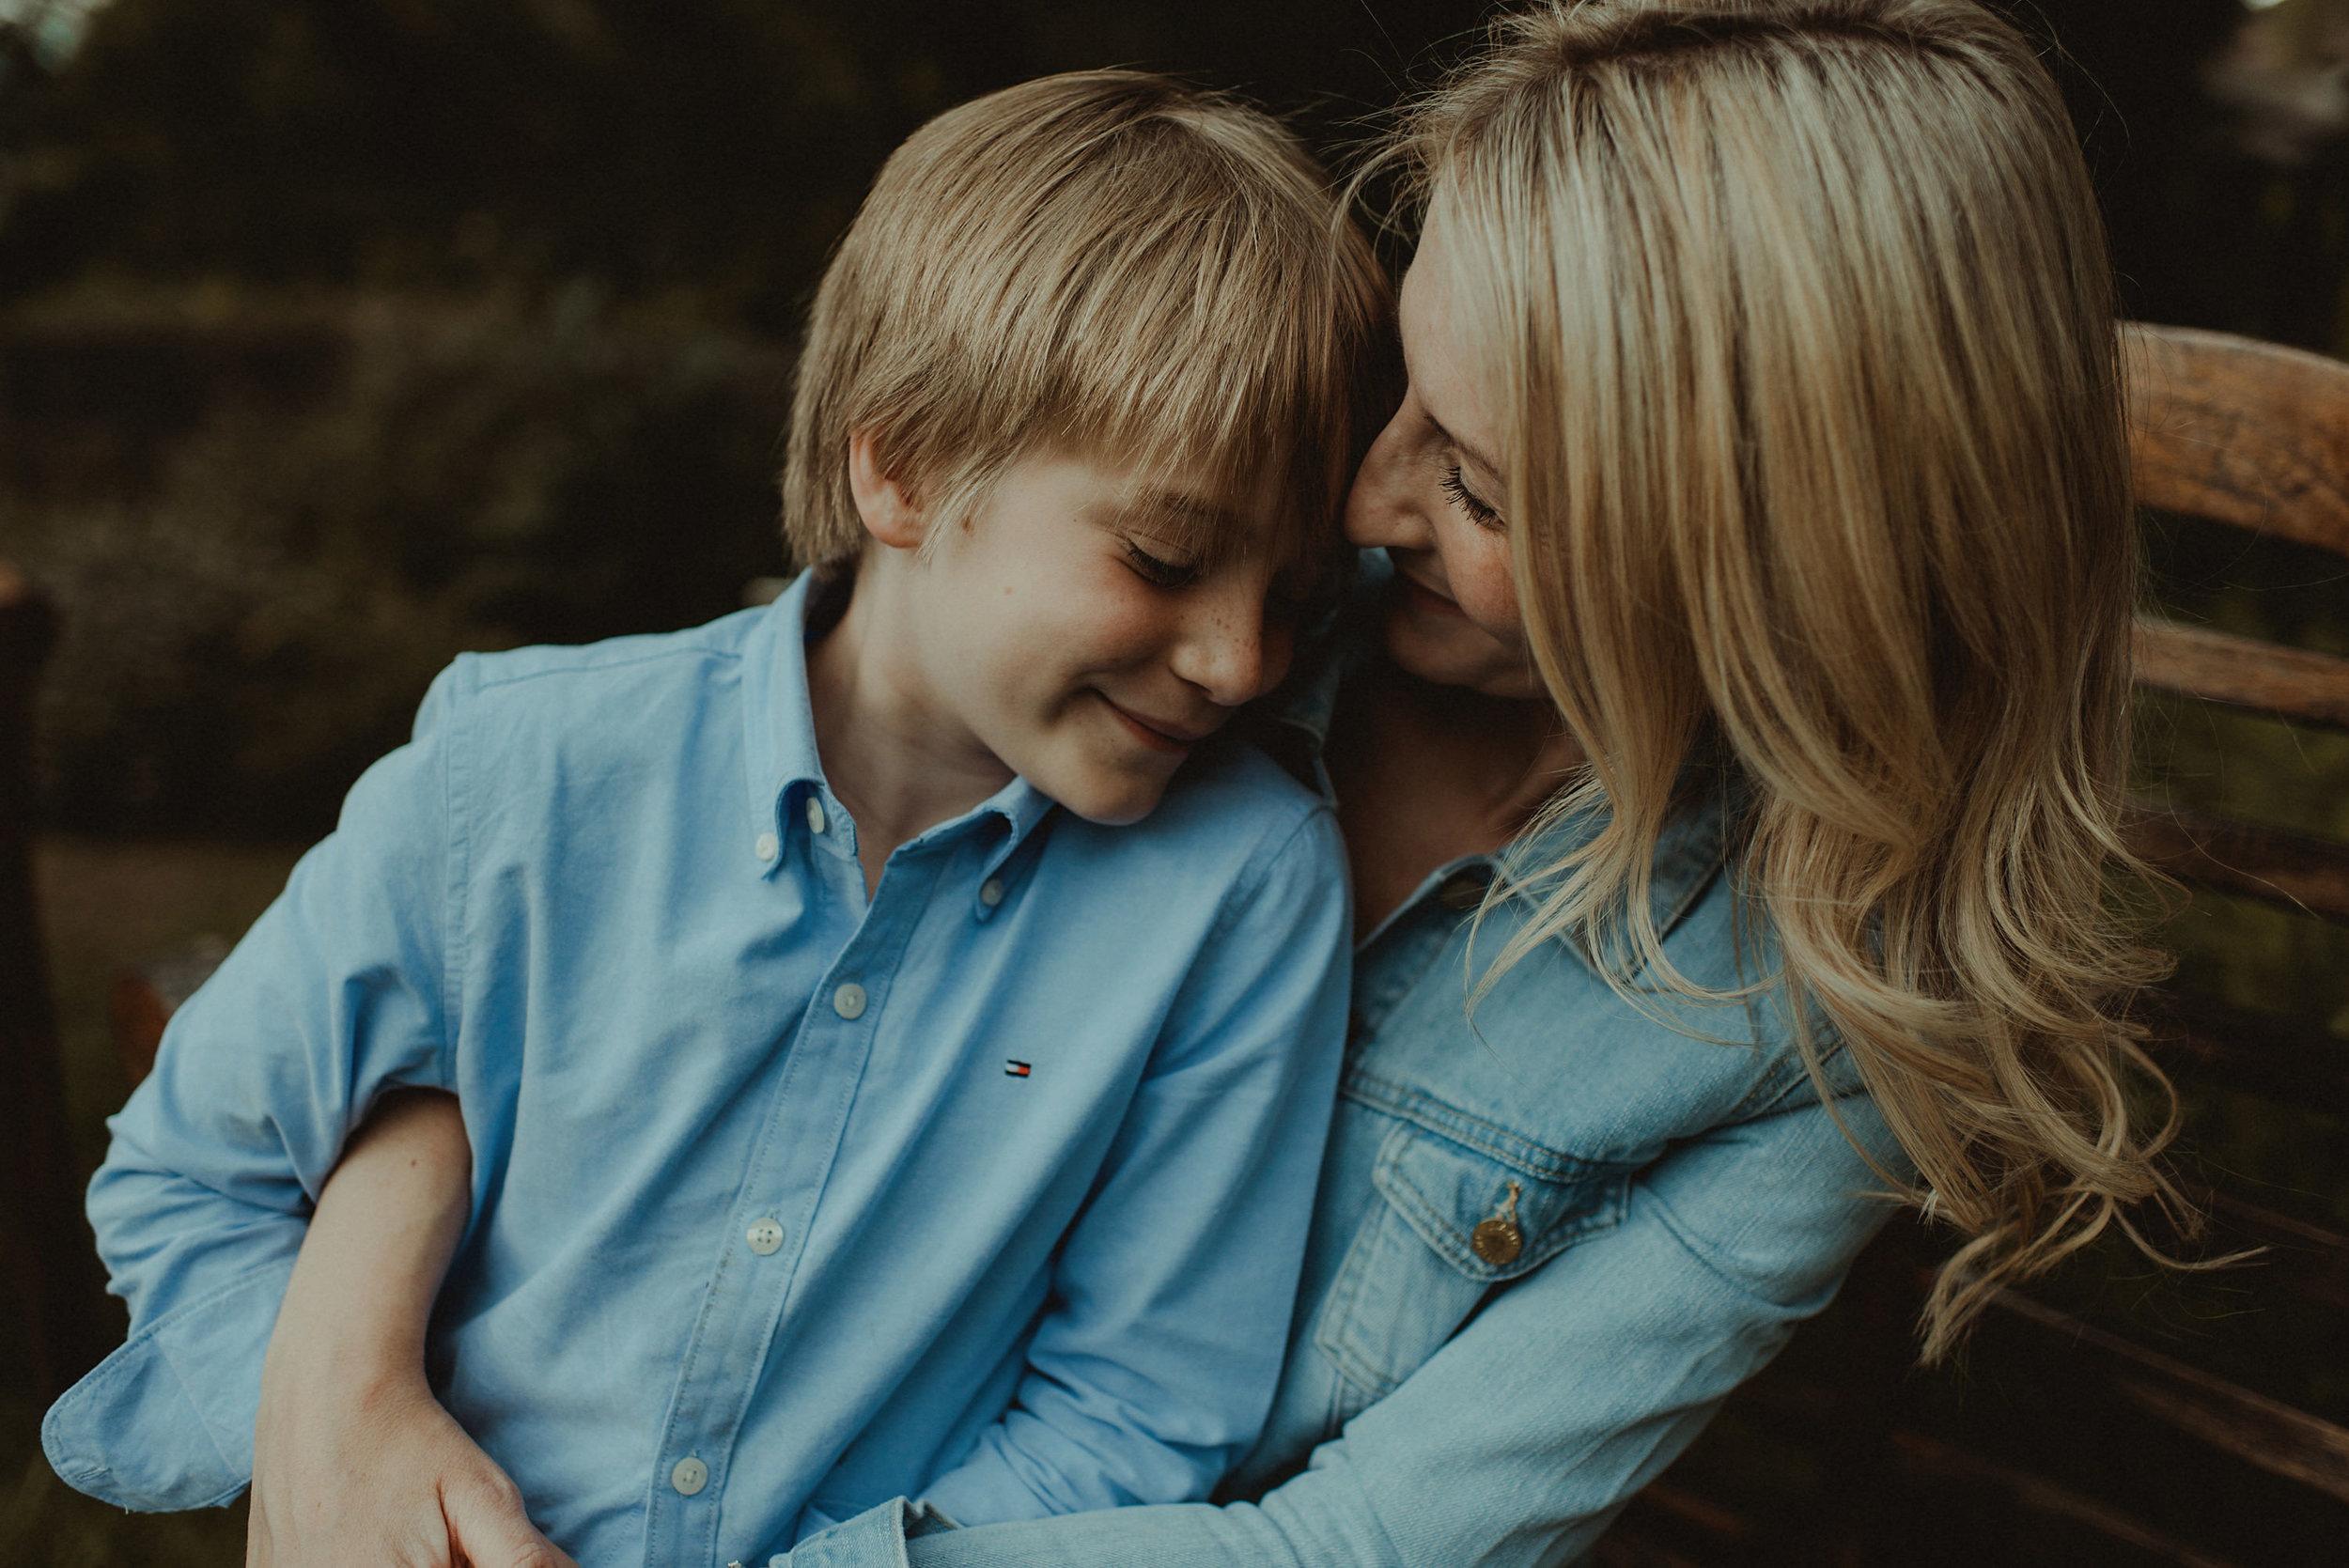 Family_Photographer_Glasgow_Nikki_Leadbetter_Photography-244.jpg